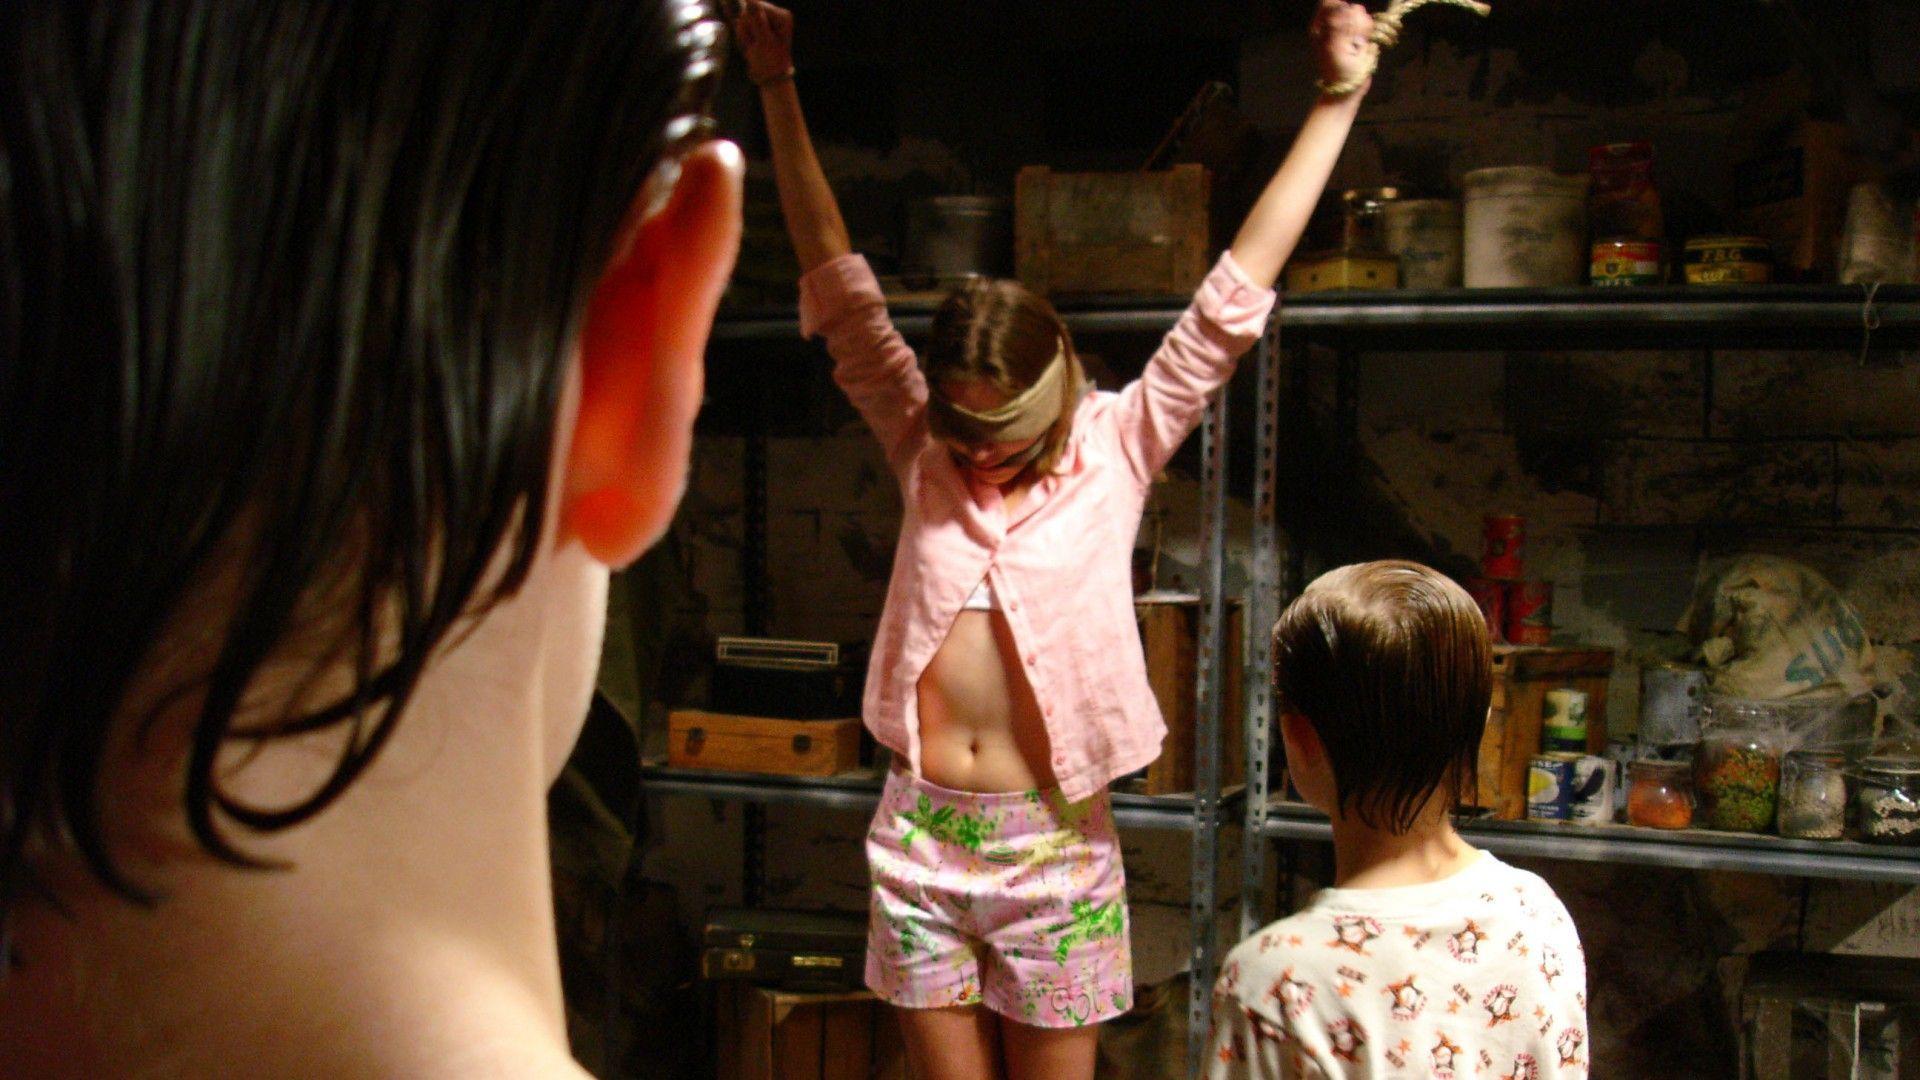 Girl next door movie true story, naked girls having a shower